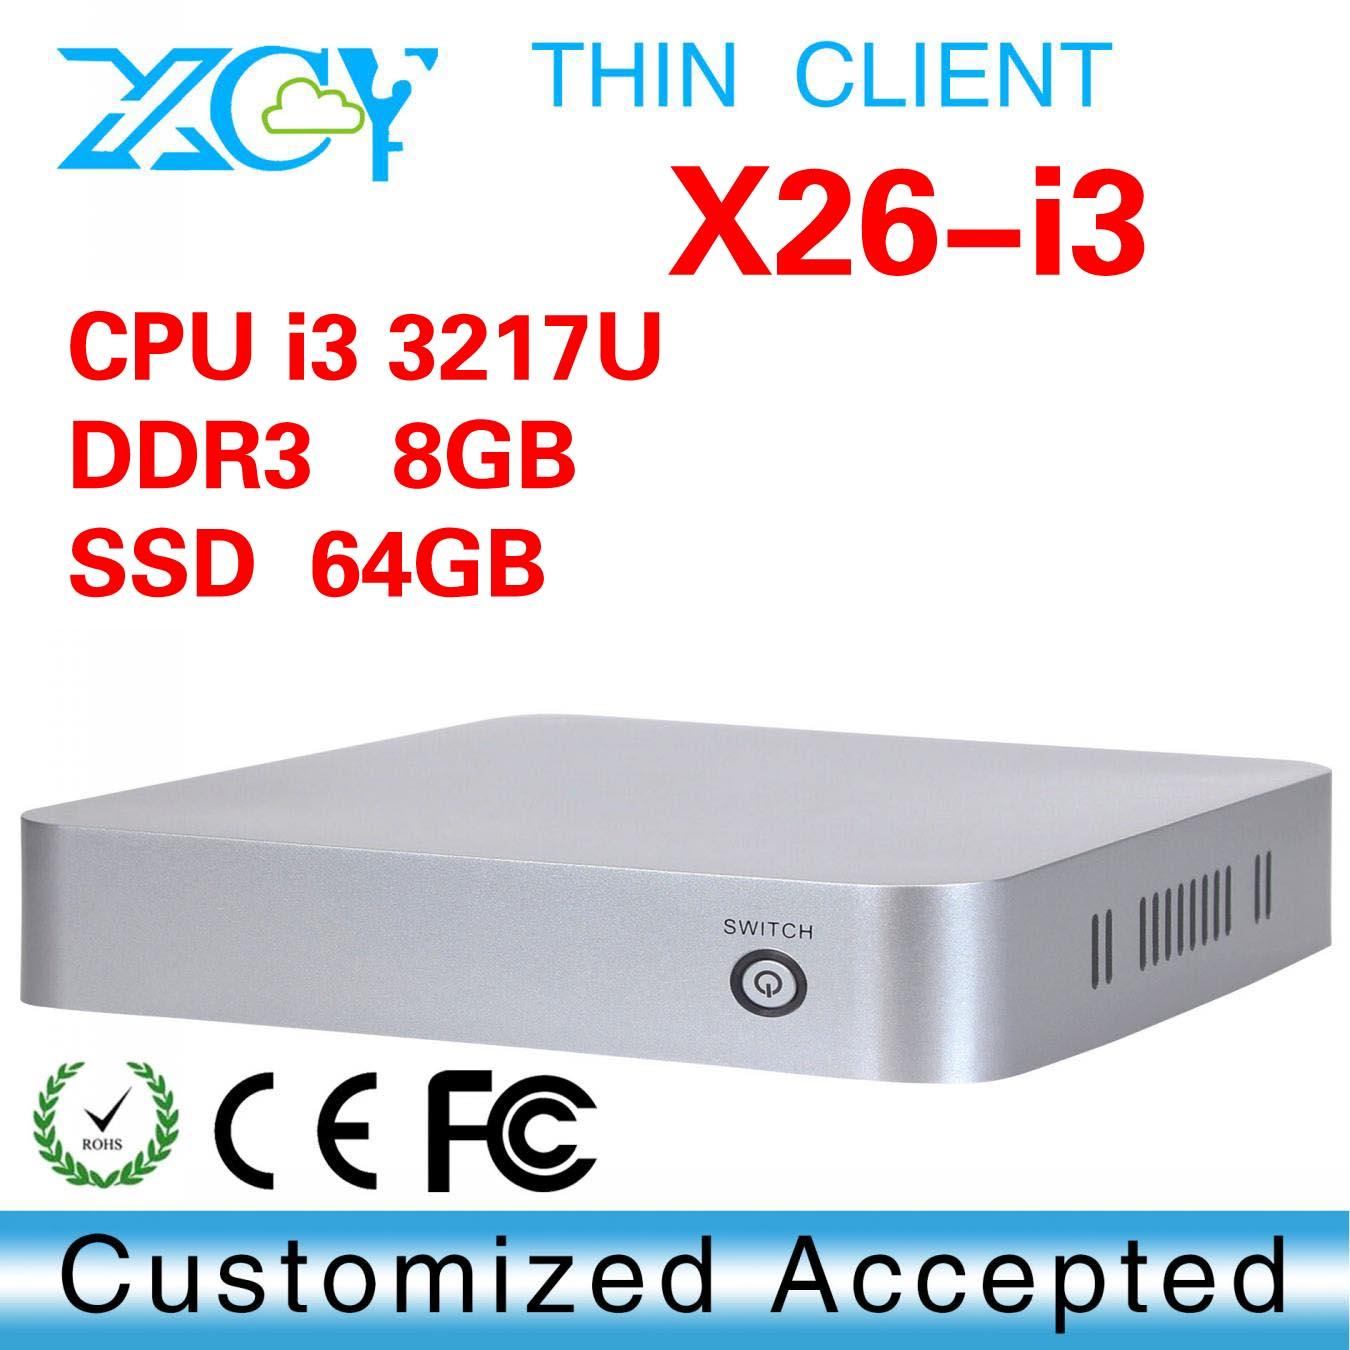 mini computer power supply 12V, XCY X26-I3 wifi pc station thin client, x86 embedded mini box pc(China (Mainland))